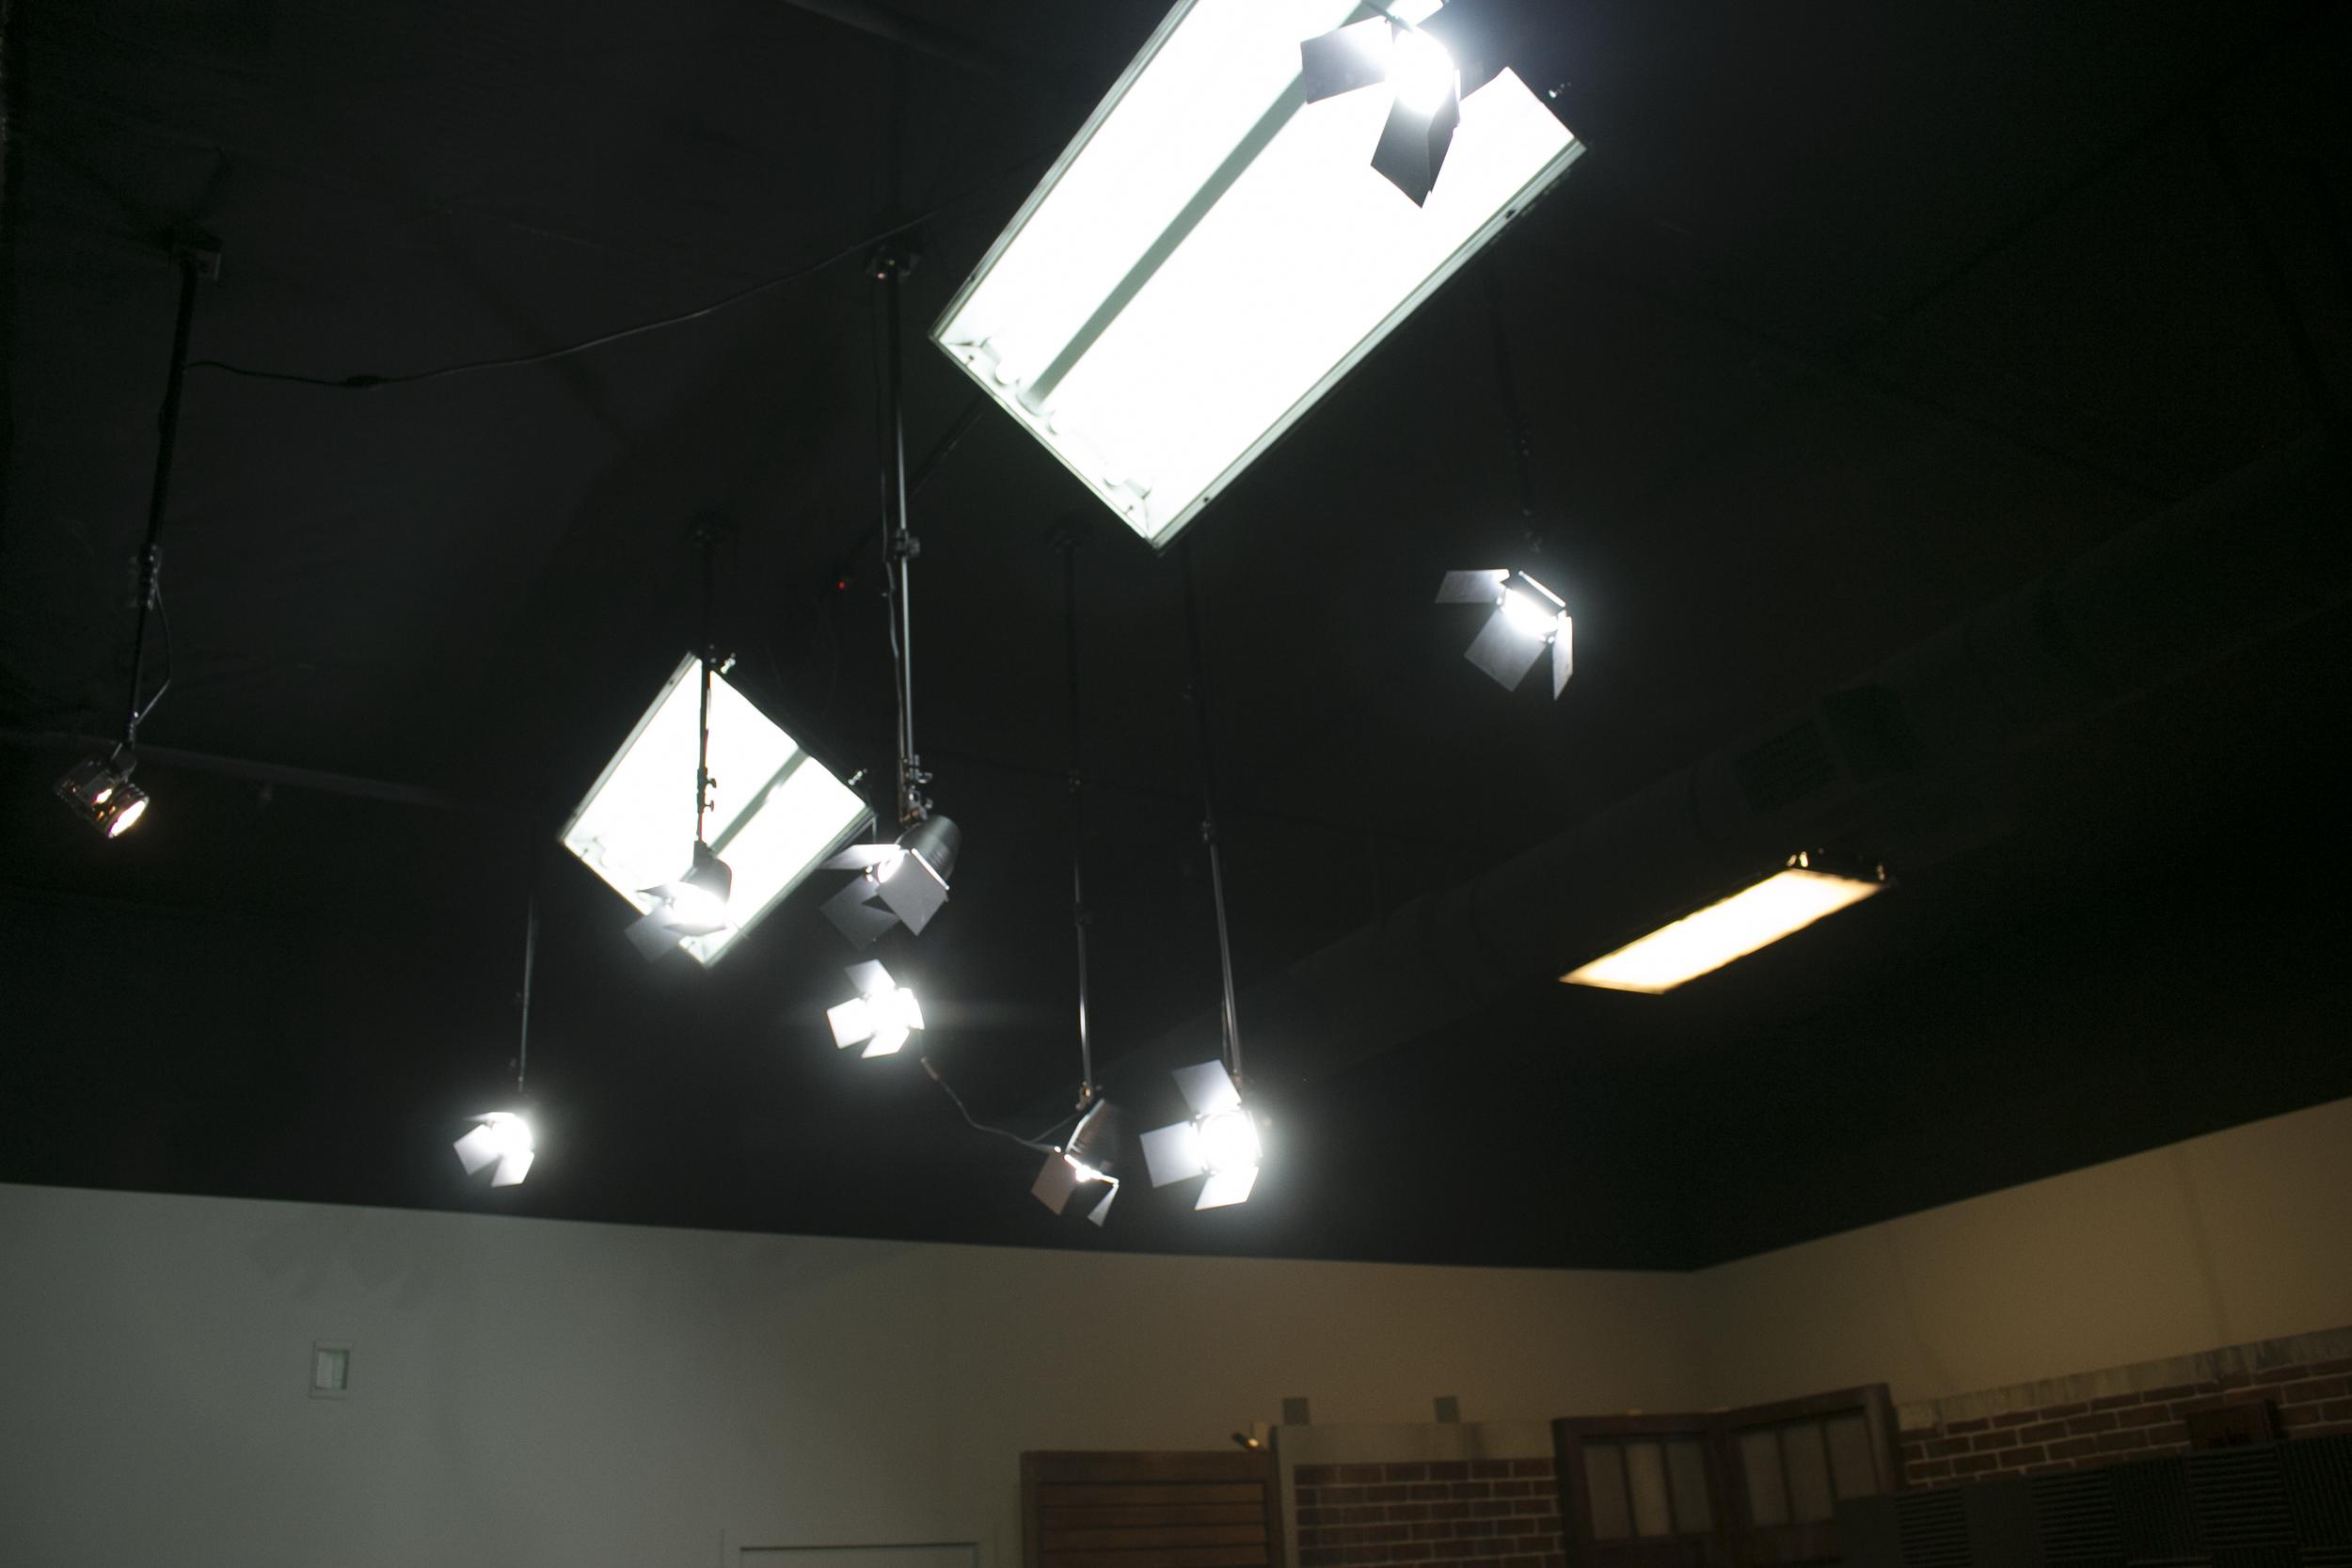 Pre-set lights